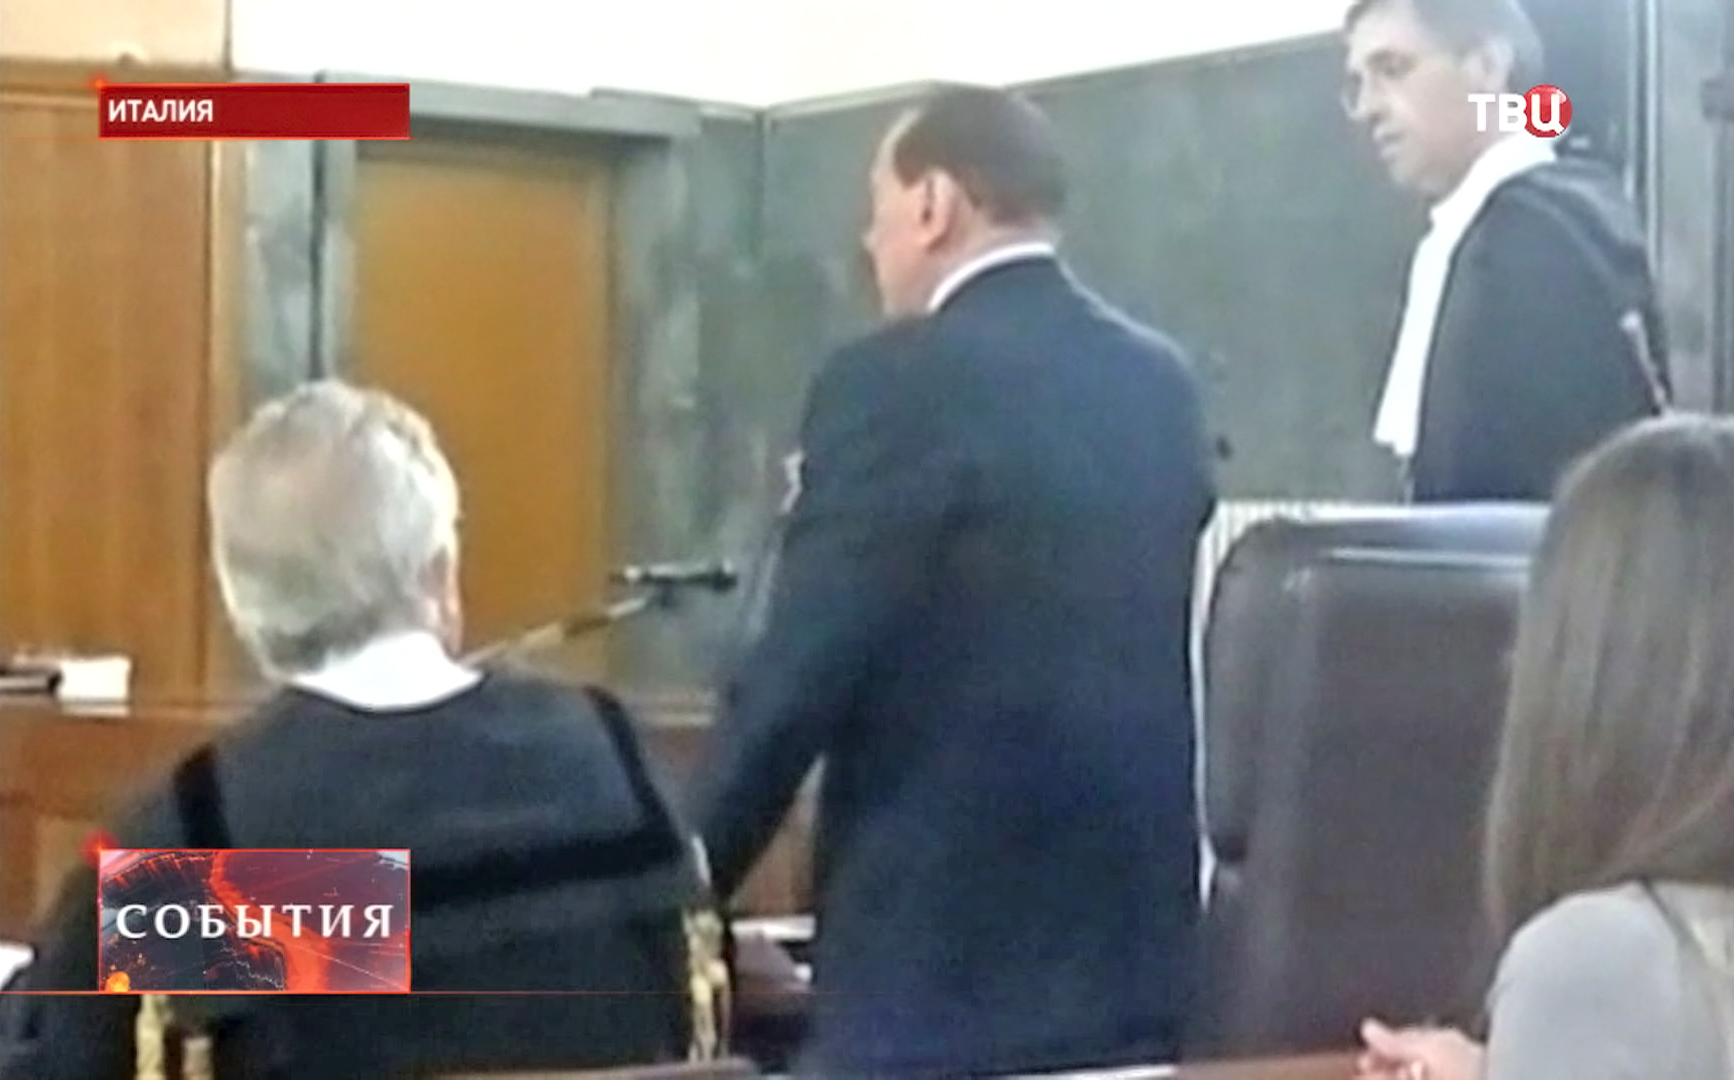 Сильвио Берлускони в зале суда